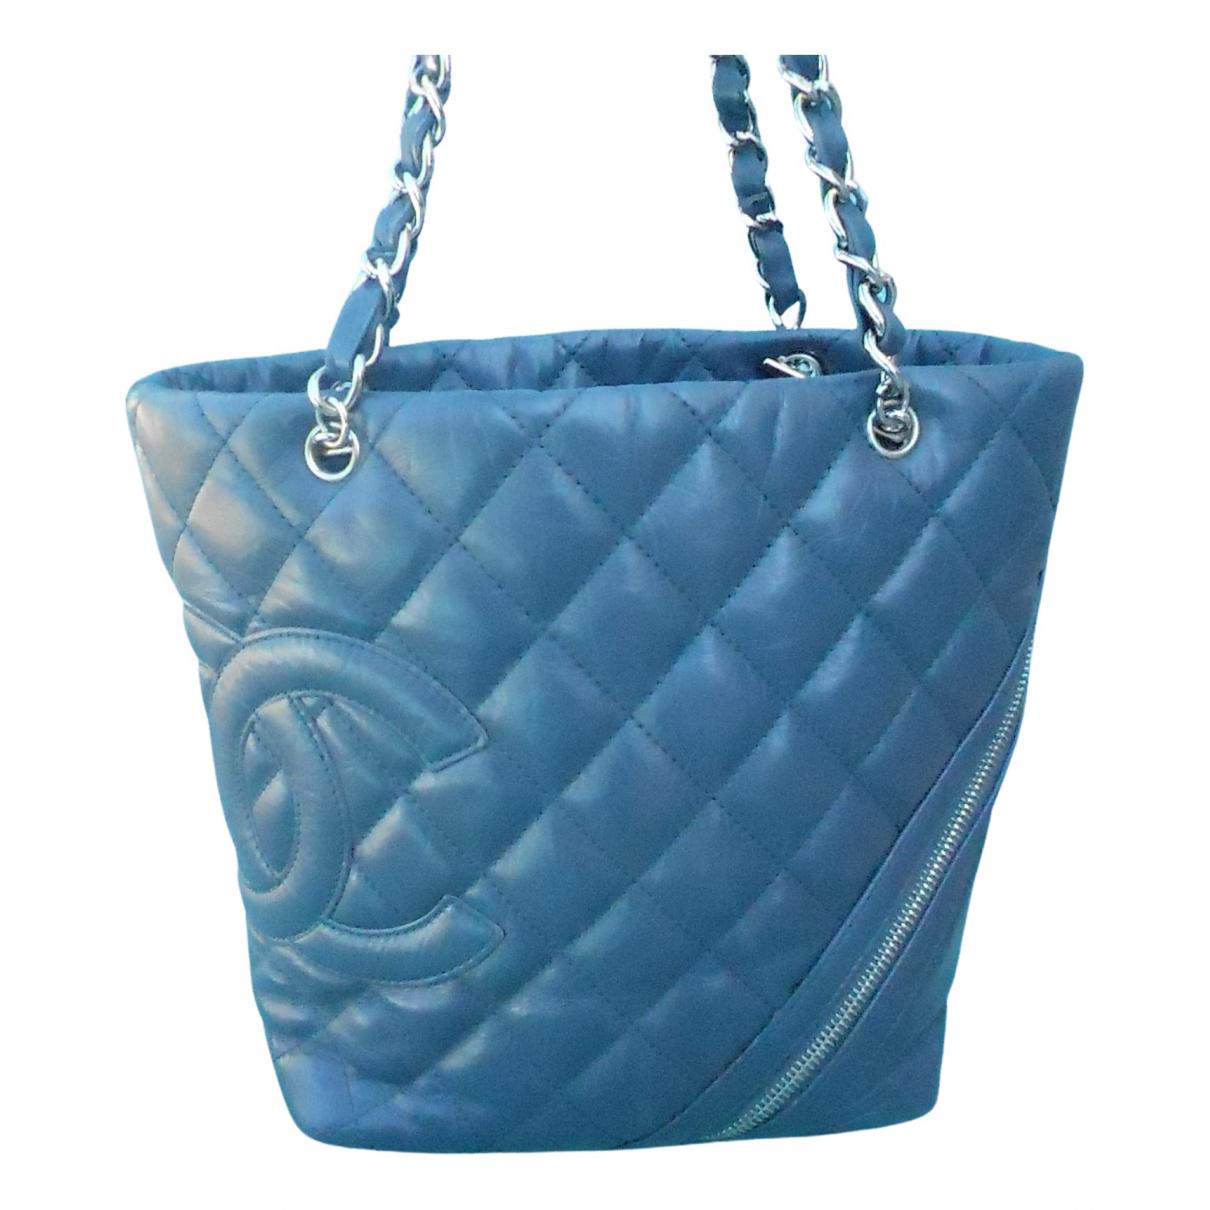 Chanel Cambon Blue Leather handbag for Women N